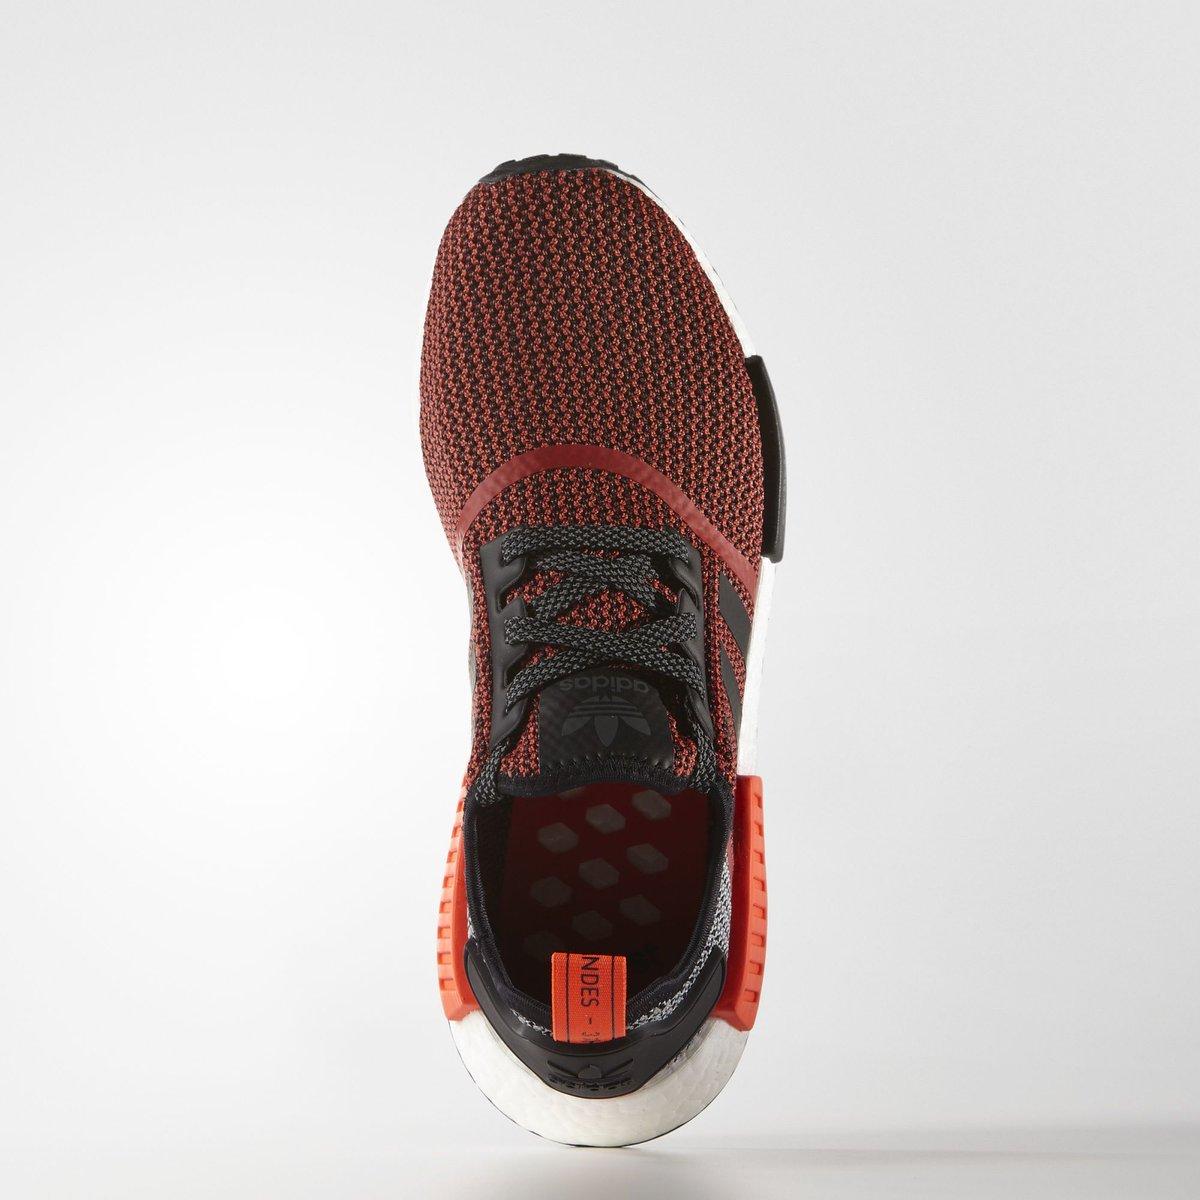 Adidas Nmd Runner Red Black White